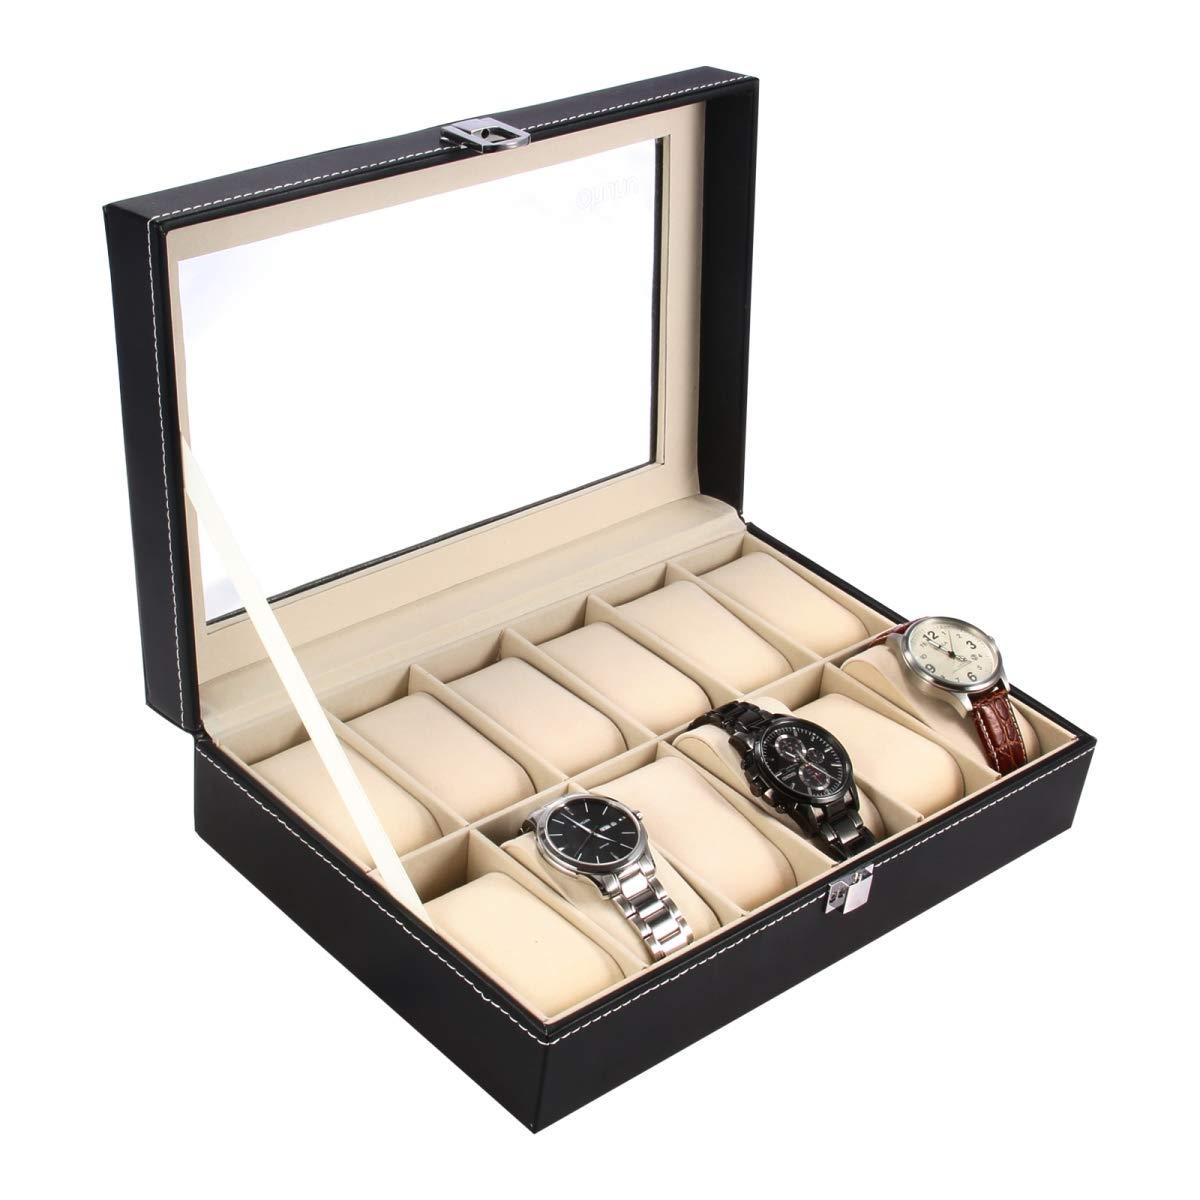 Ohuhu Watch Cases, 12 Slot Watch Box PU Leather Watches Organizer Case Lock Key, Black - Beige